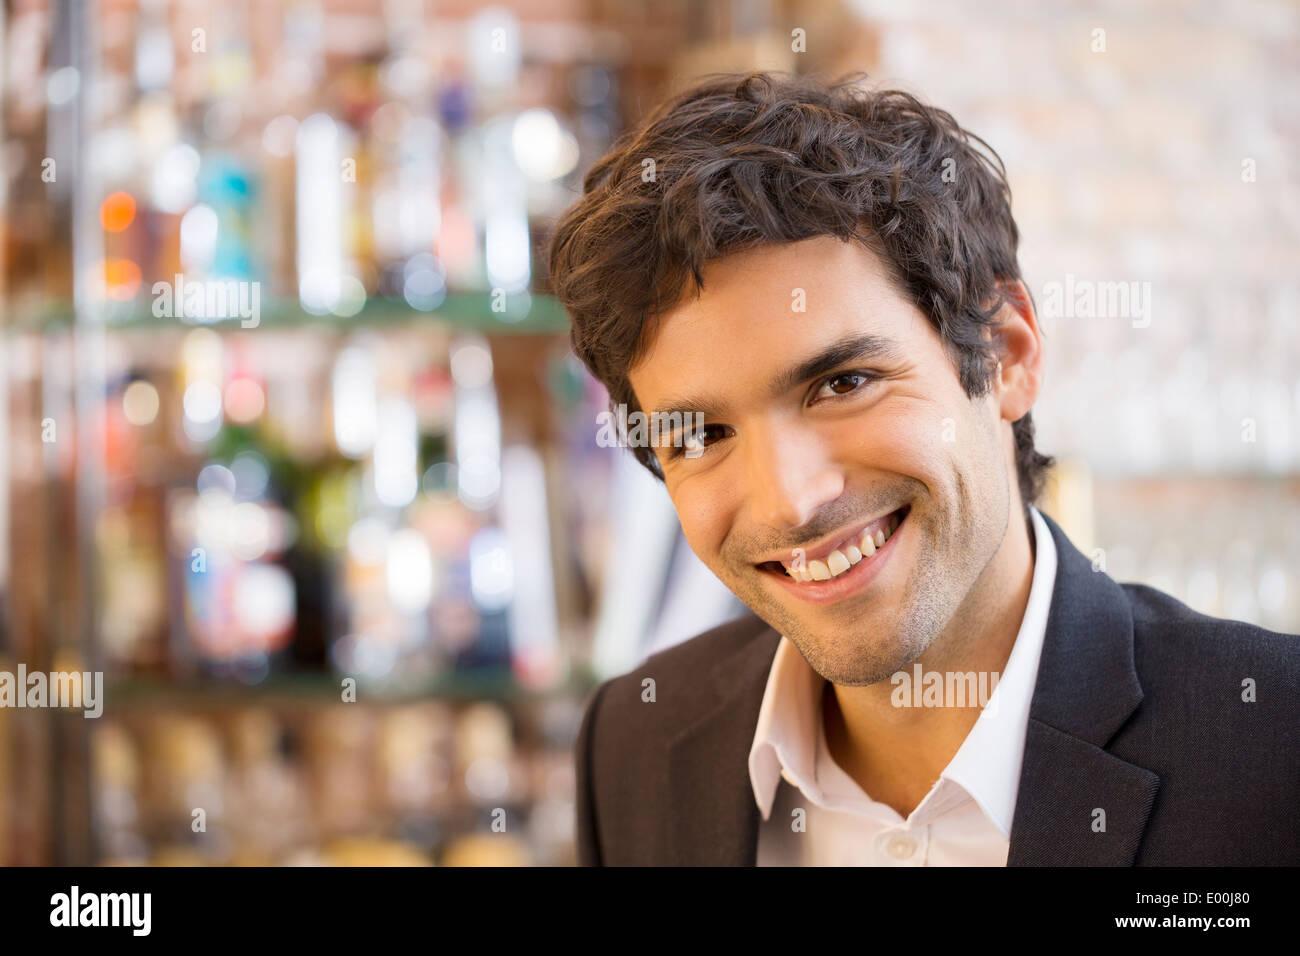 Macho sonriendo alegre cafetería Buscando cámara Imagen De Stock